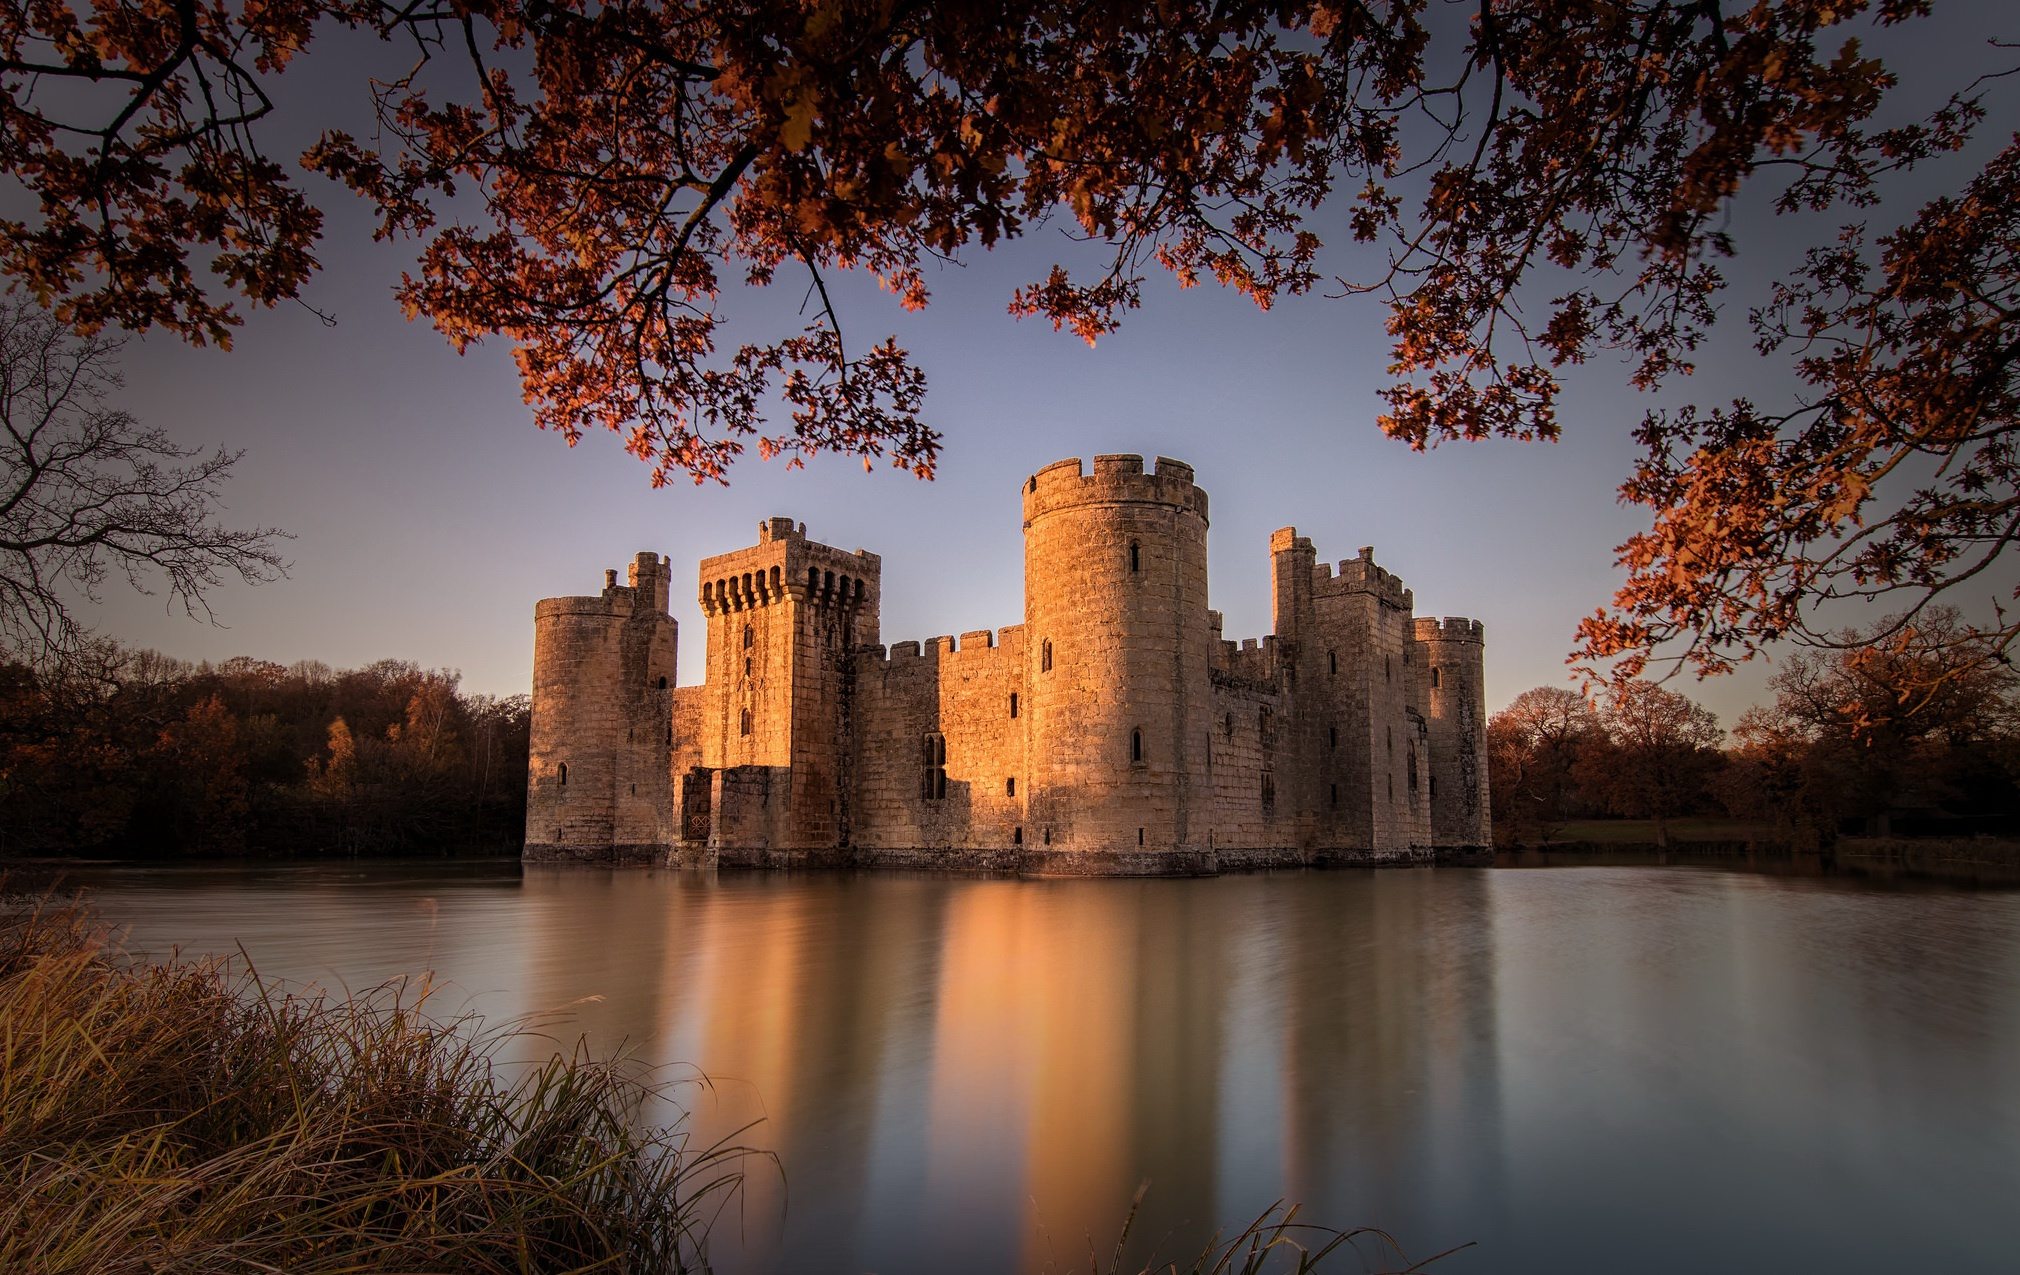 Bodiam Castle Building Castle England Lake Reflection 2020x1275